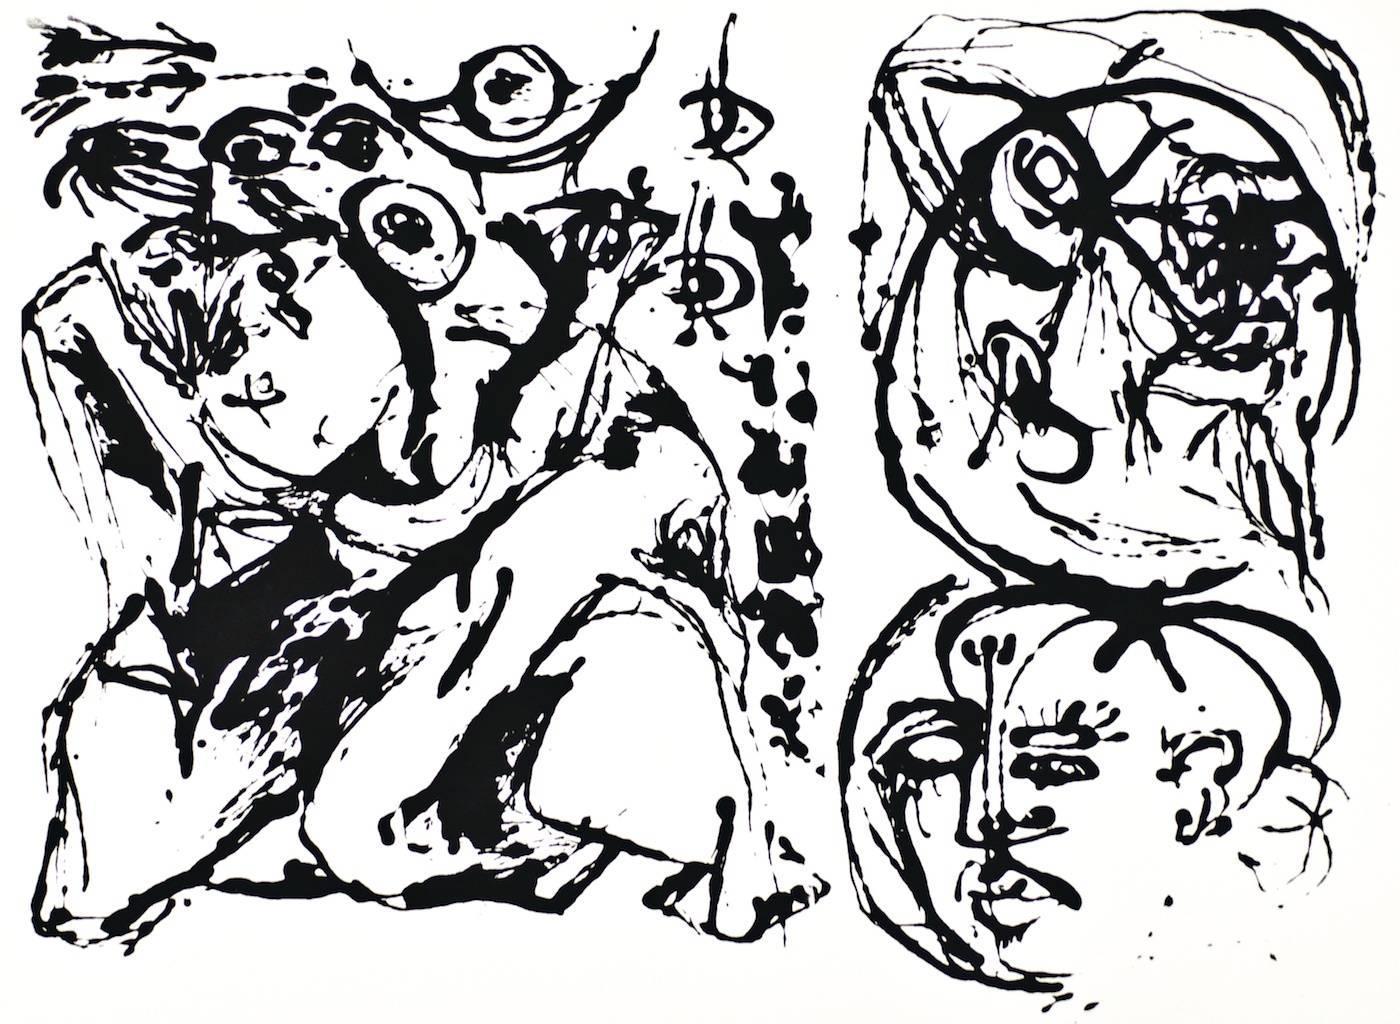 Untitled - Original Screen Print After Jackson Pollock - 1964